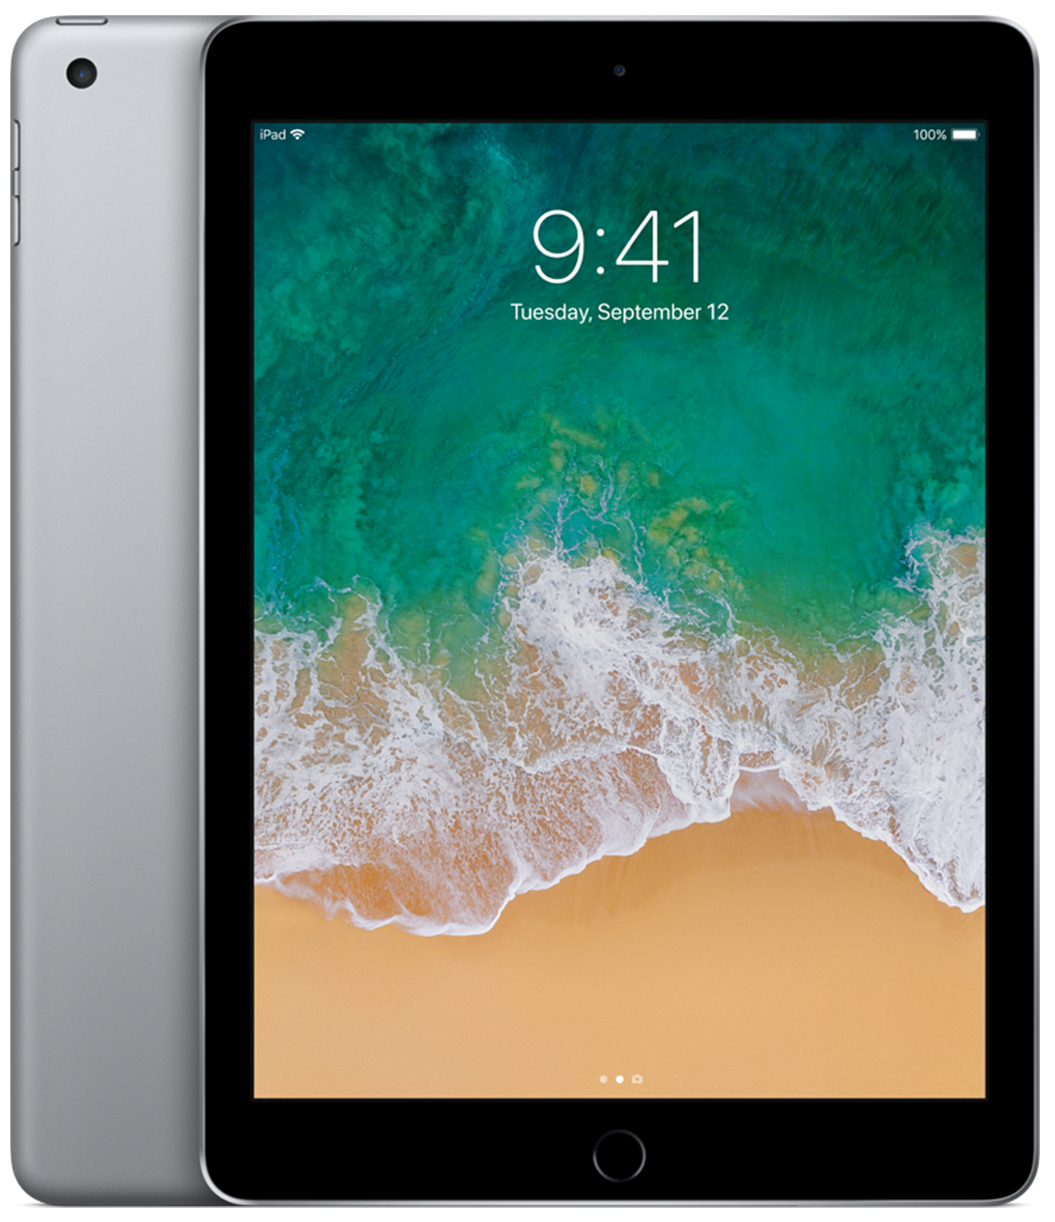 Apple iPad 5 (2017) - 128GB - Space Grey - A Grade Tweedehands